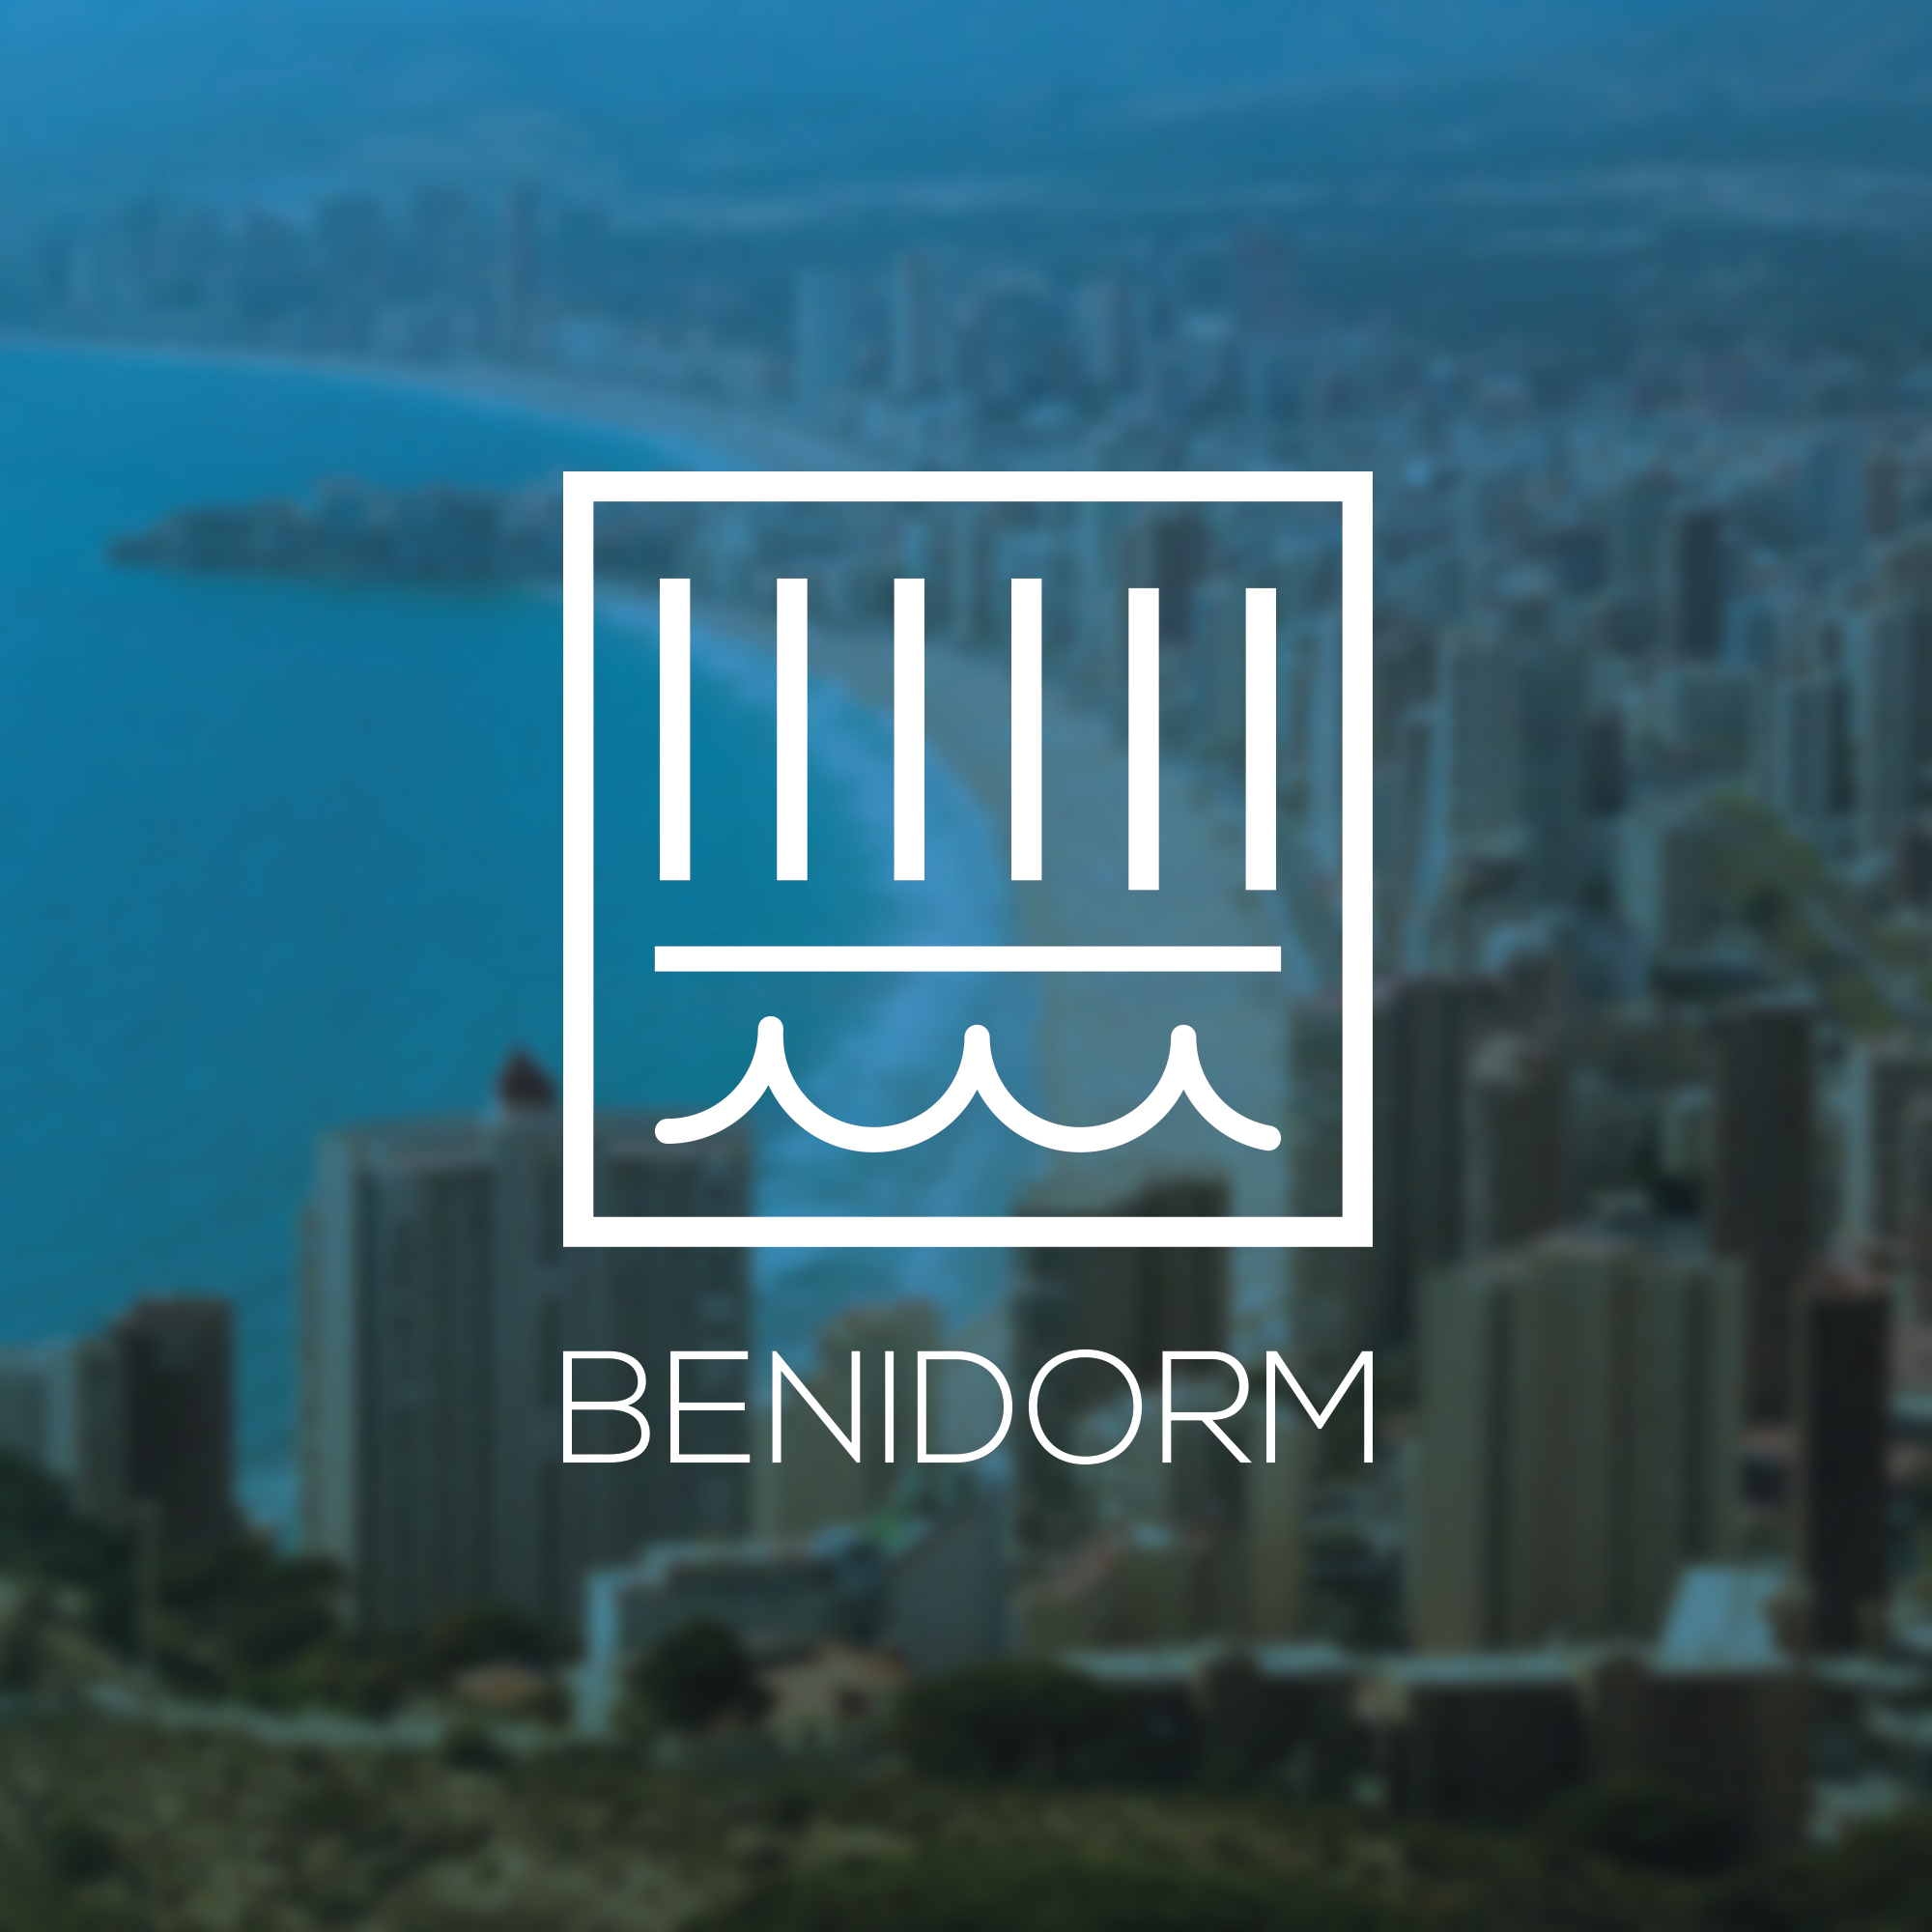 Design for #Benidormbytalents contest by Lucia Sancho